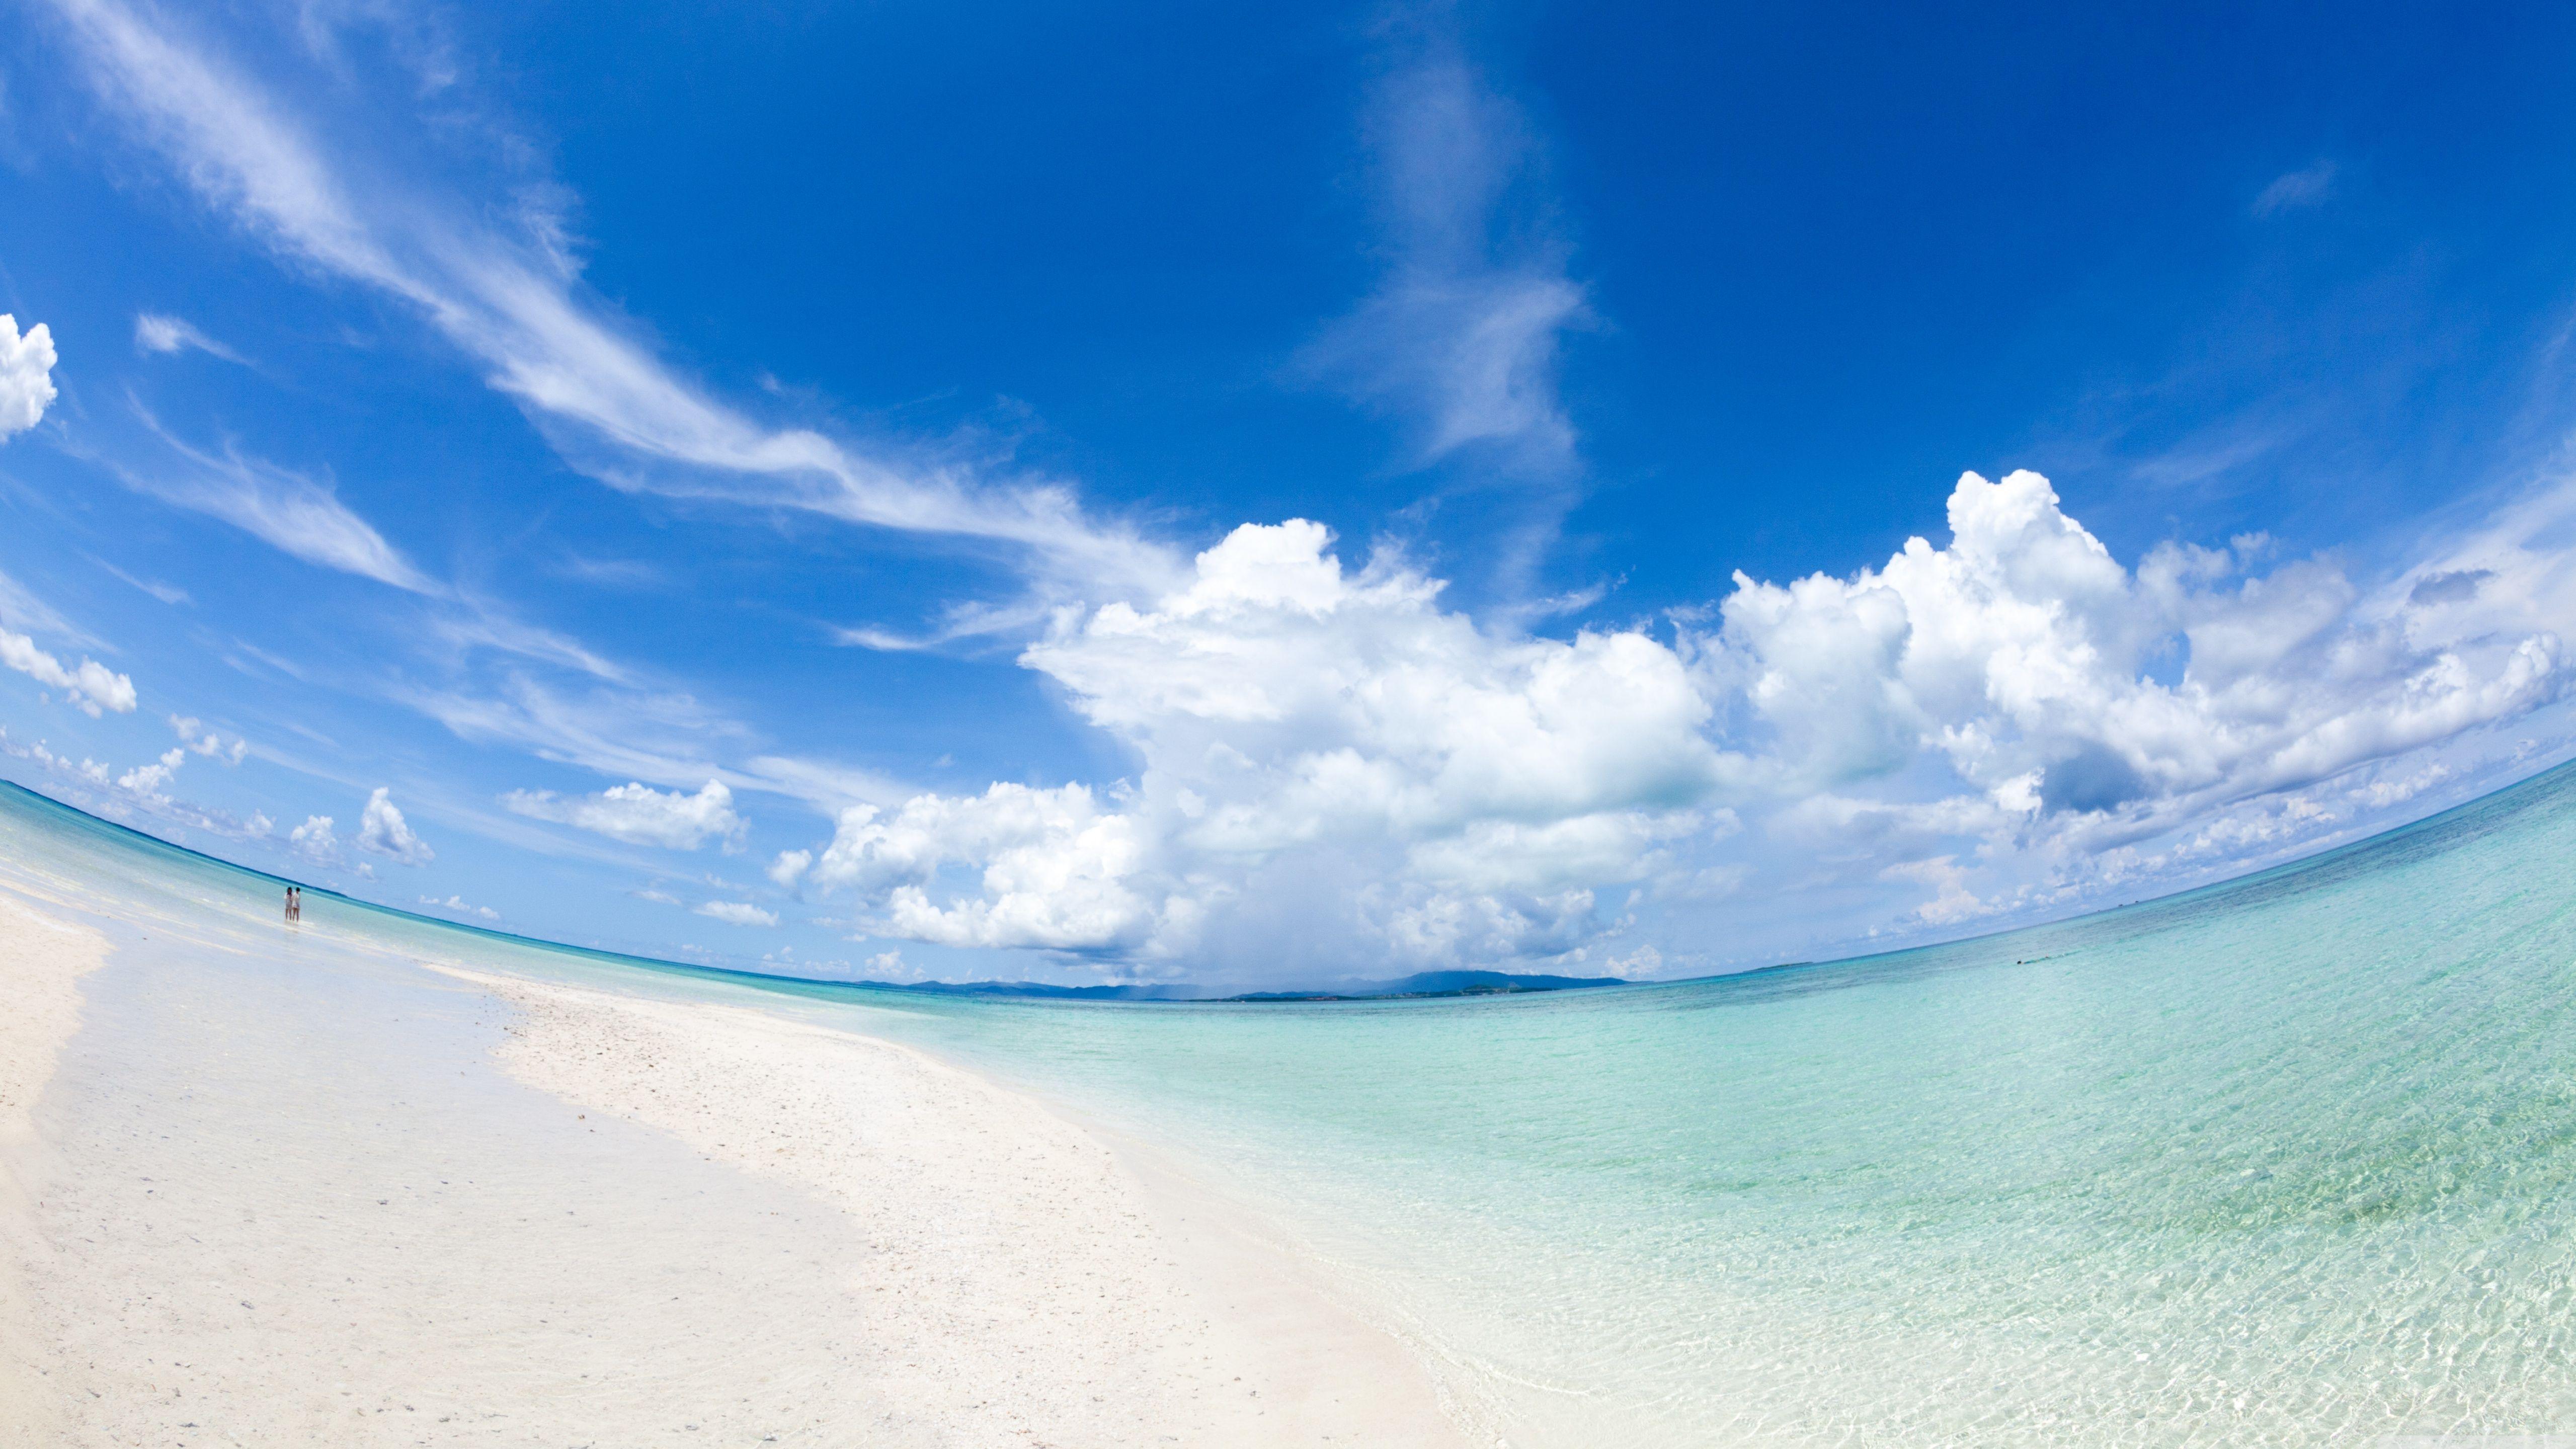 Japan Beach Wallpapers - Top Free Japan Beach Backgrounds ...